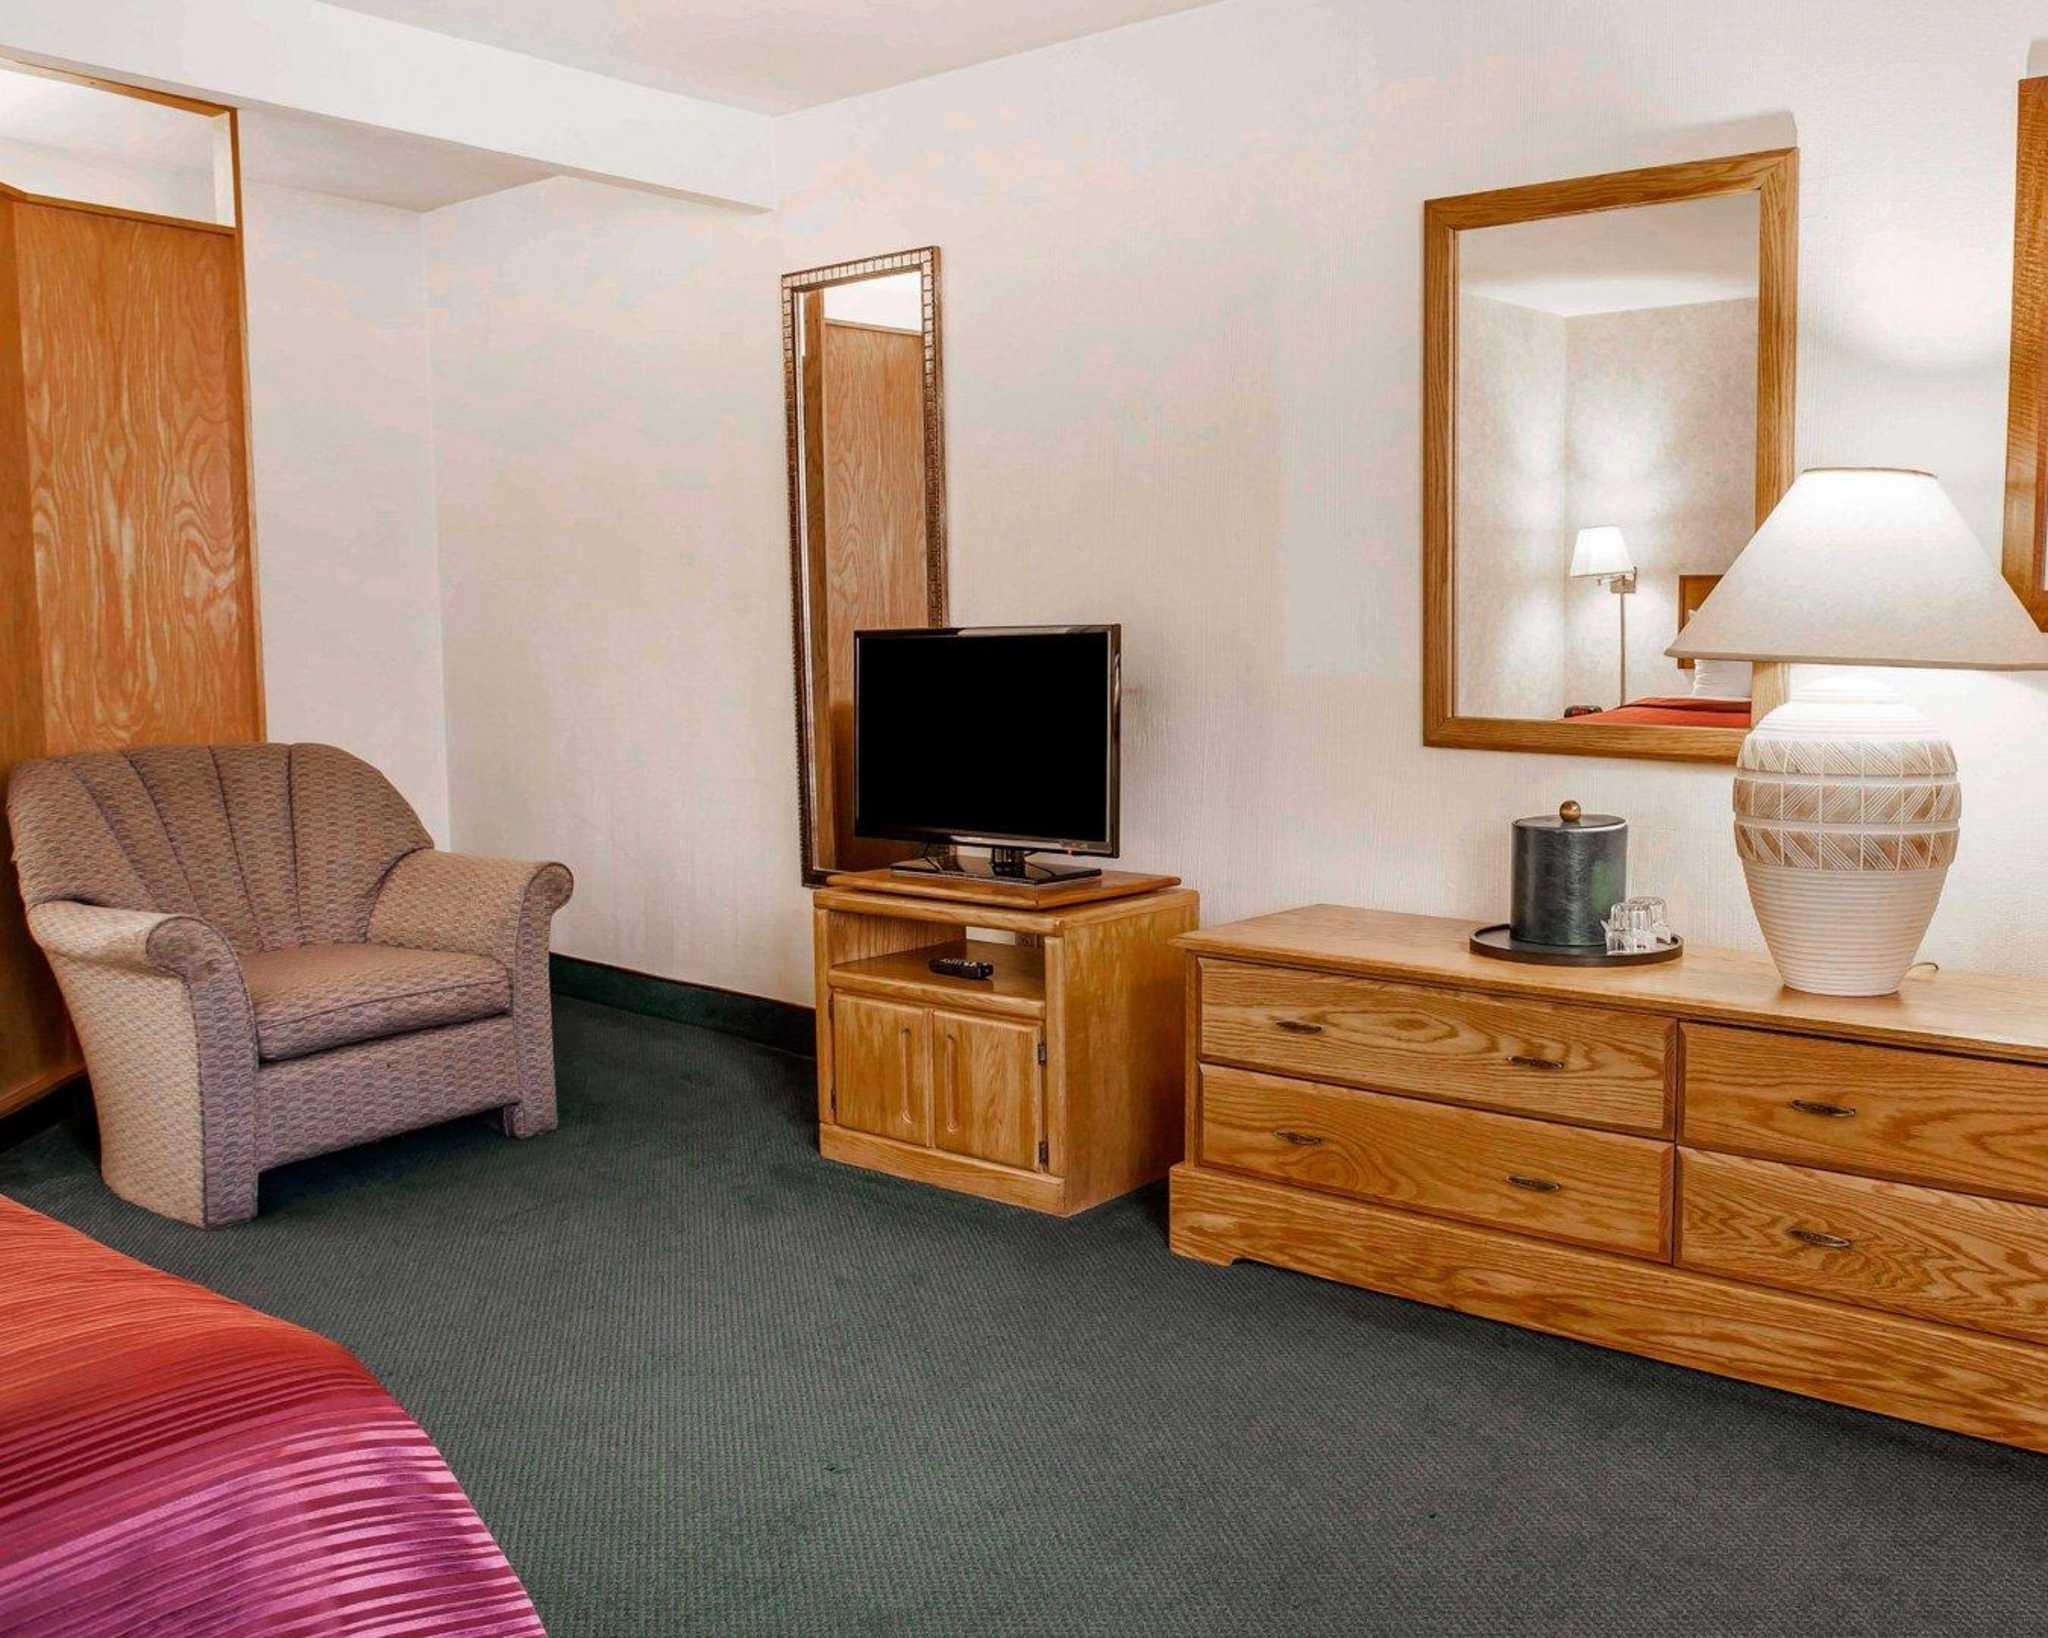 Quality Inn & Suites image 12